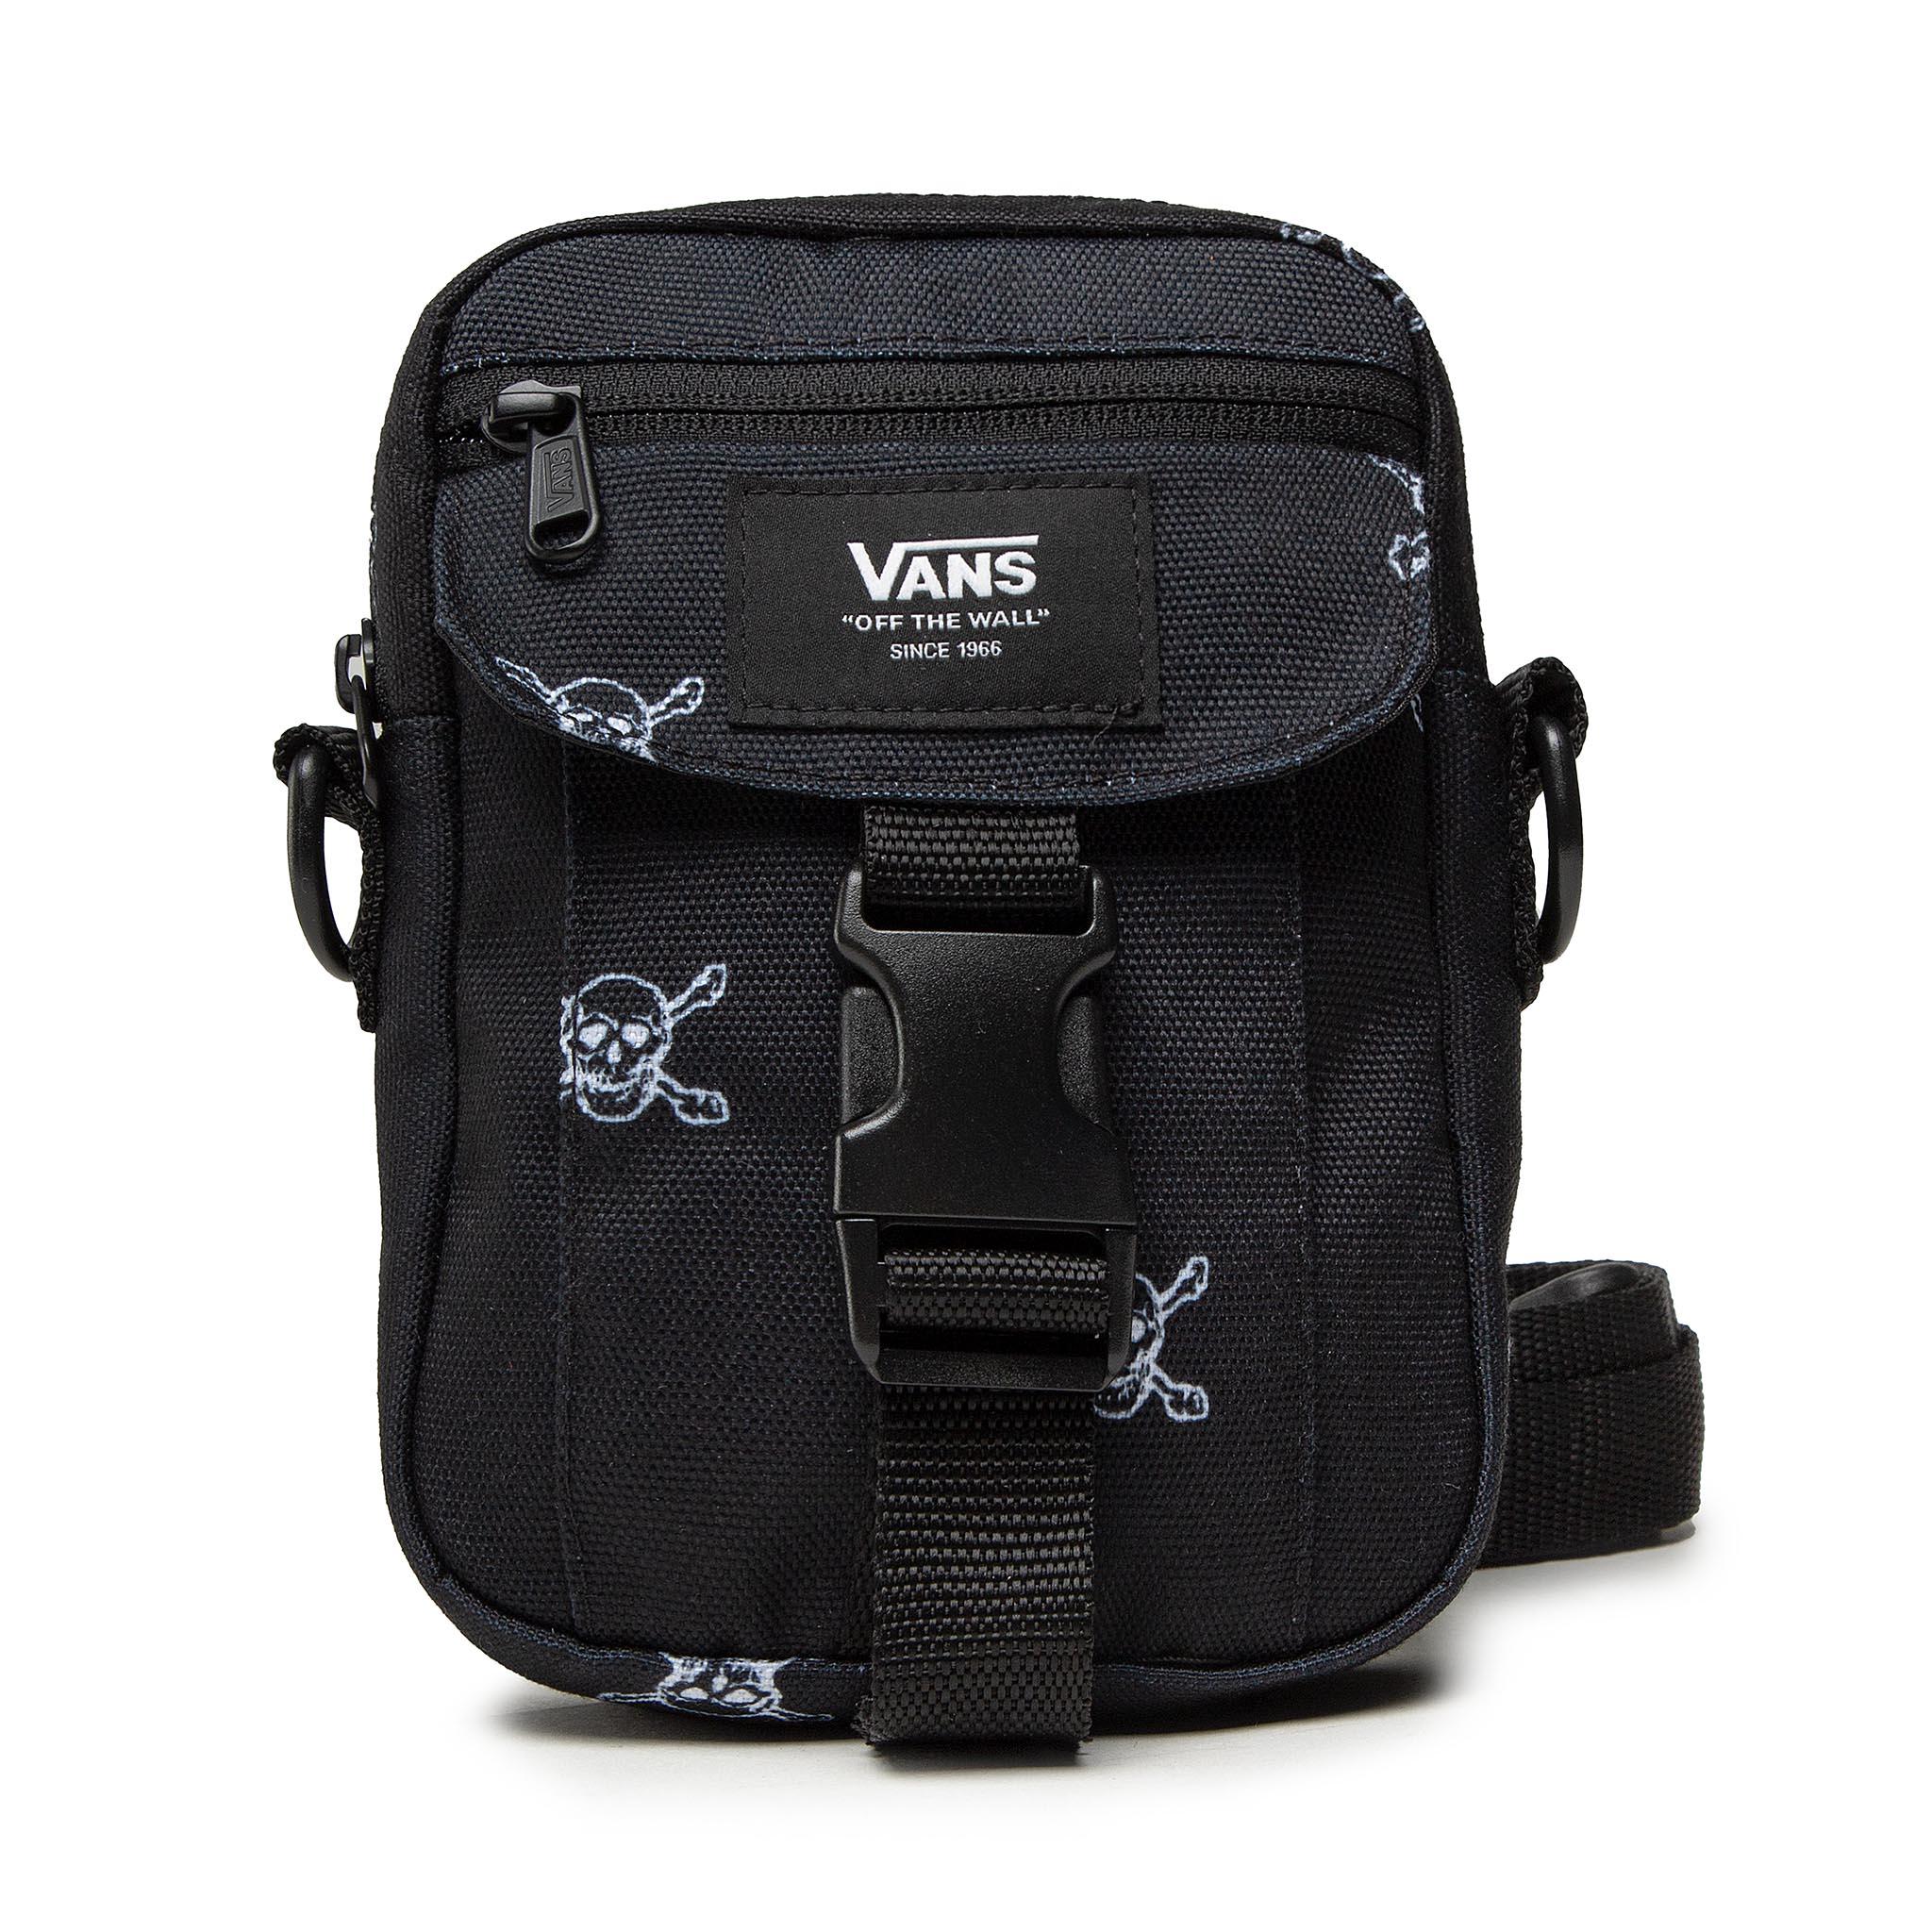 Marsupio VANS - New Varsity Shoulder Bag VN0A5FGKZ7F1 Black New Varsity